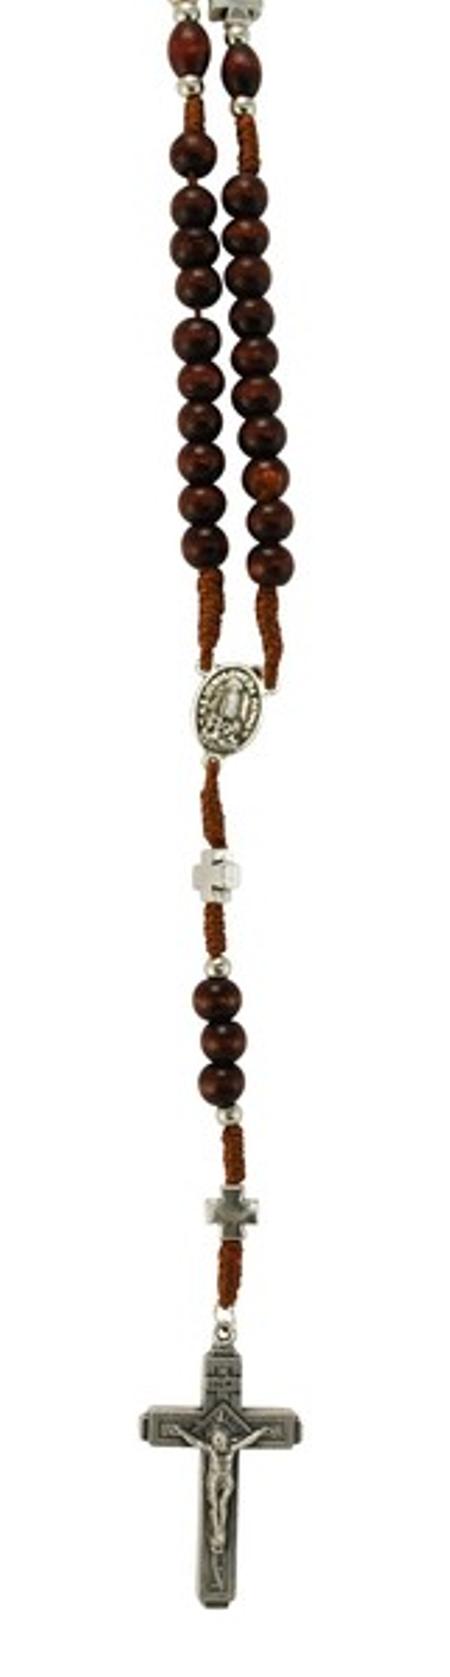 ROZENKRANS - donkerbruin met kruisjs - hout - 40,5 cm lang